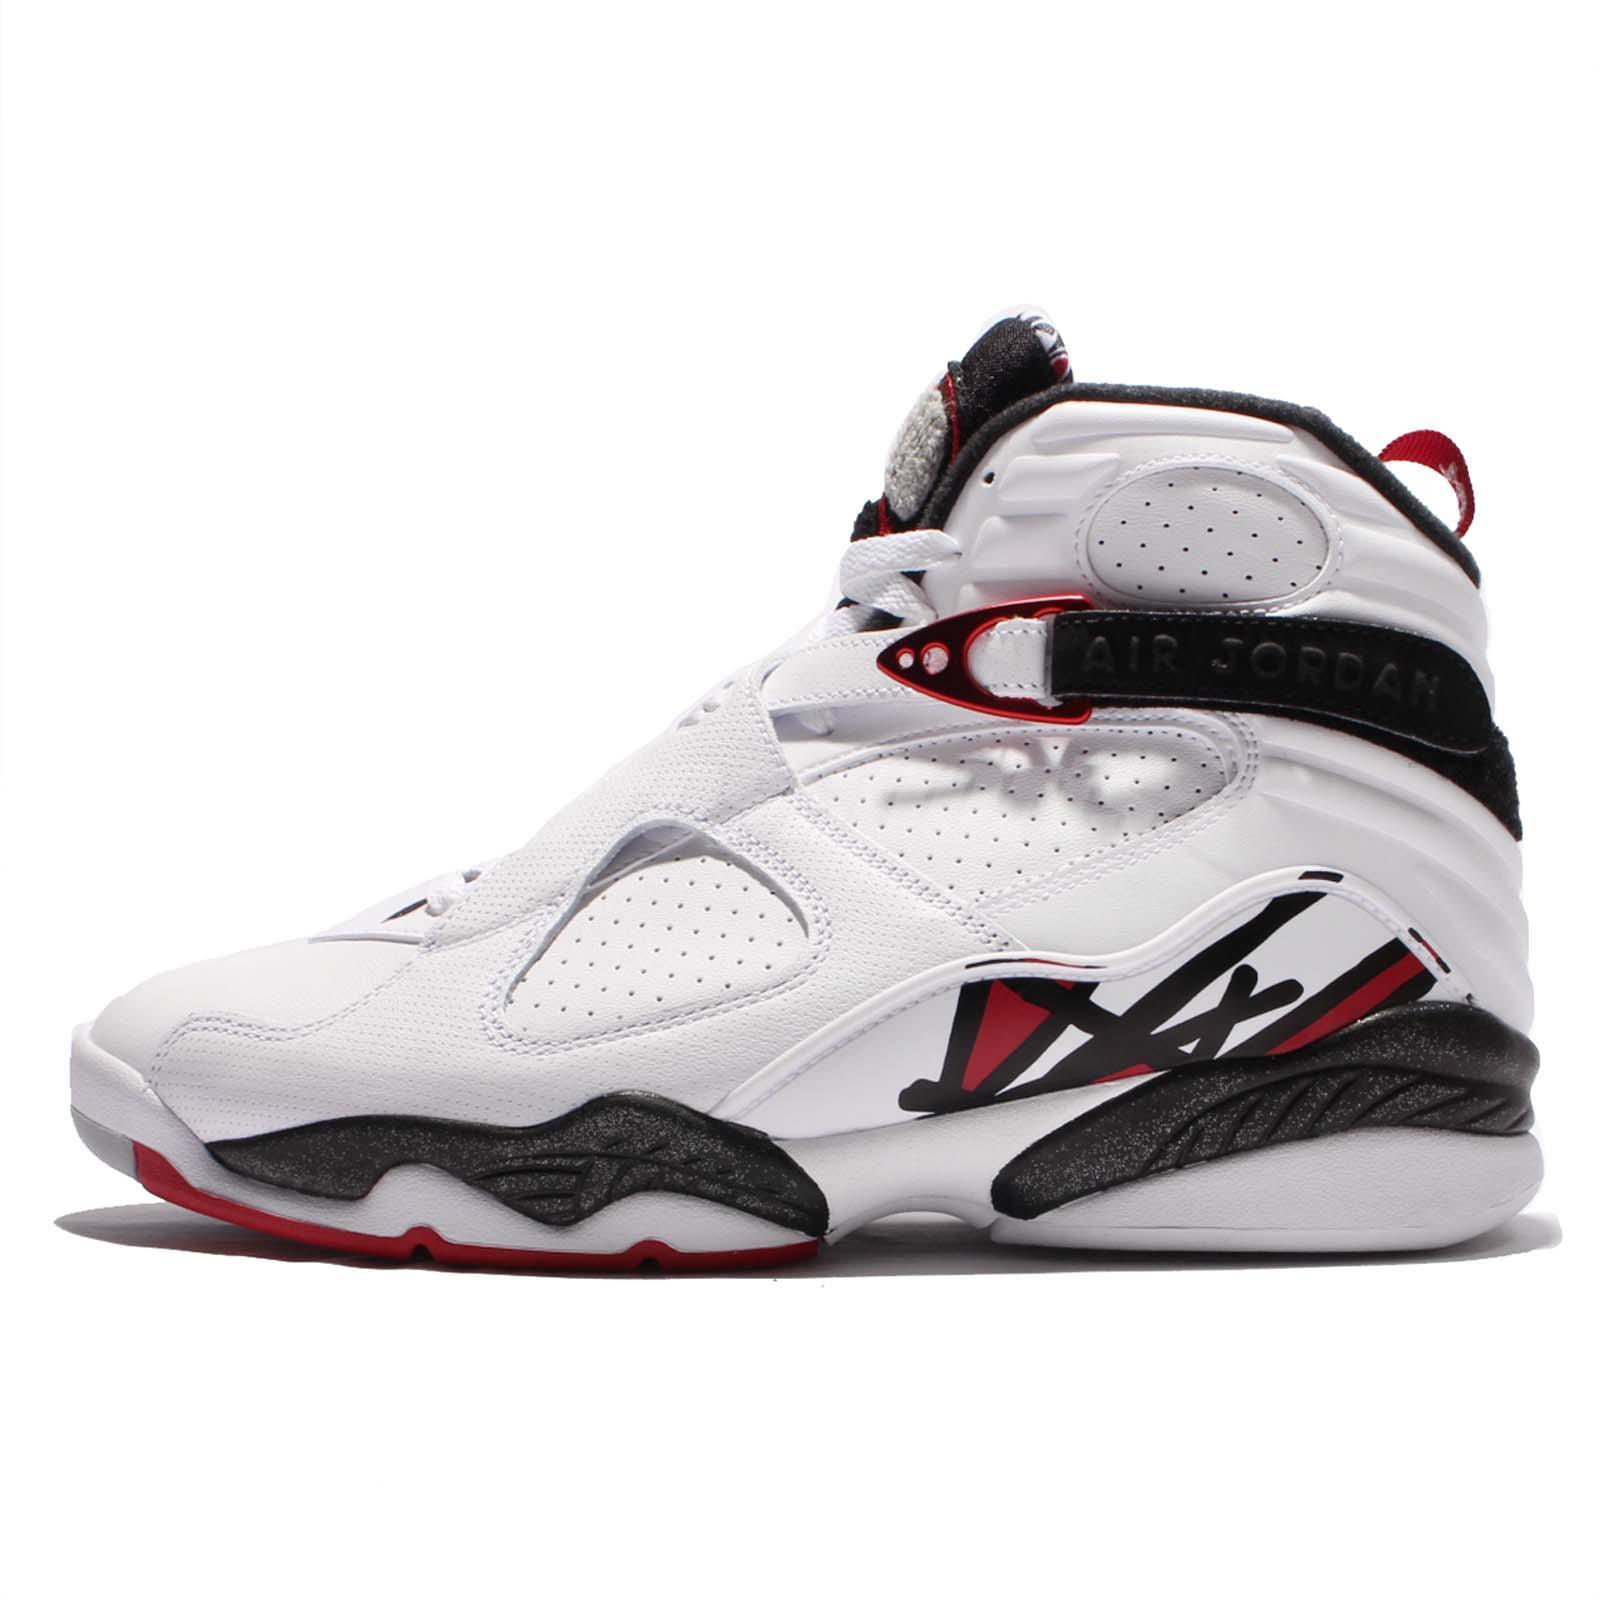 bfe11007603 ... Nike Air Jordan 8 Retro VIII Alternate Collection White Red Men AJ8  305381-104 ...